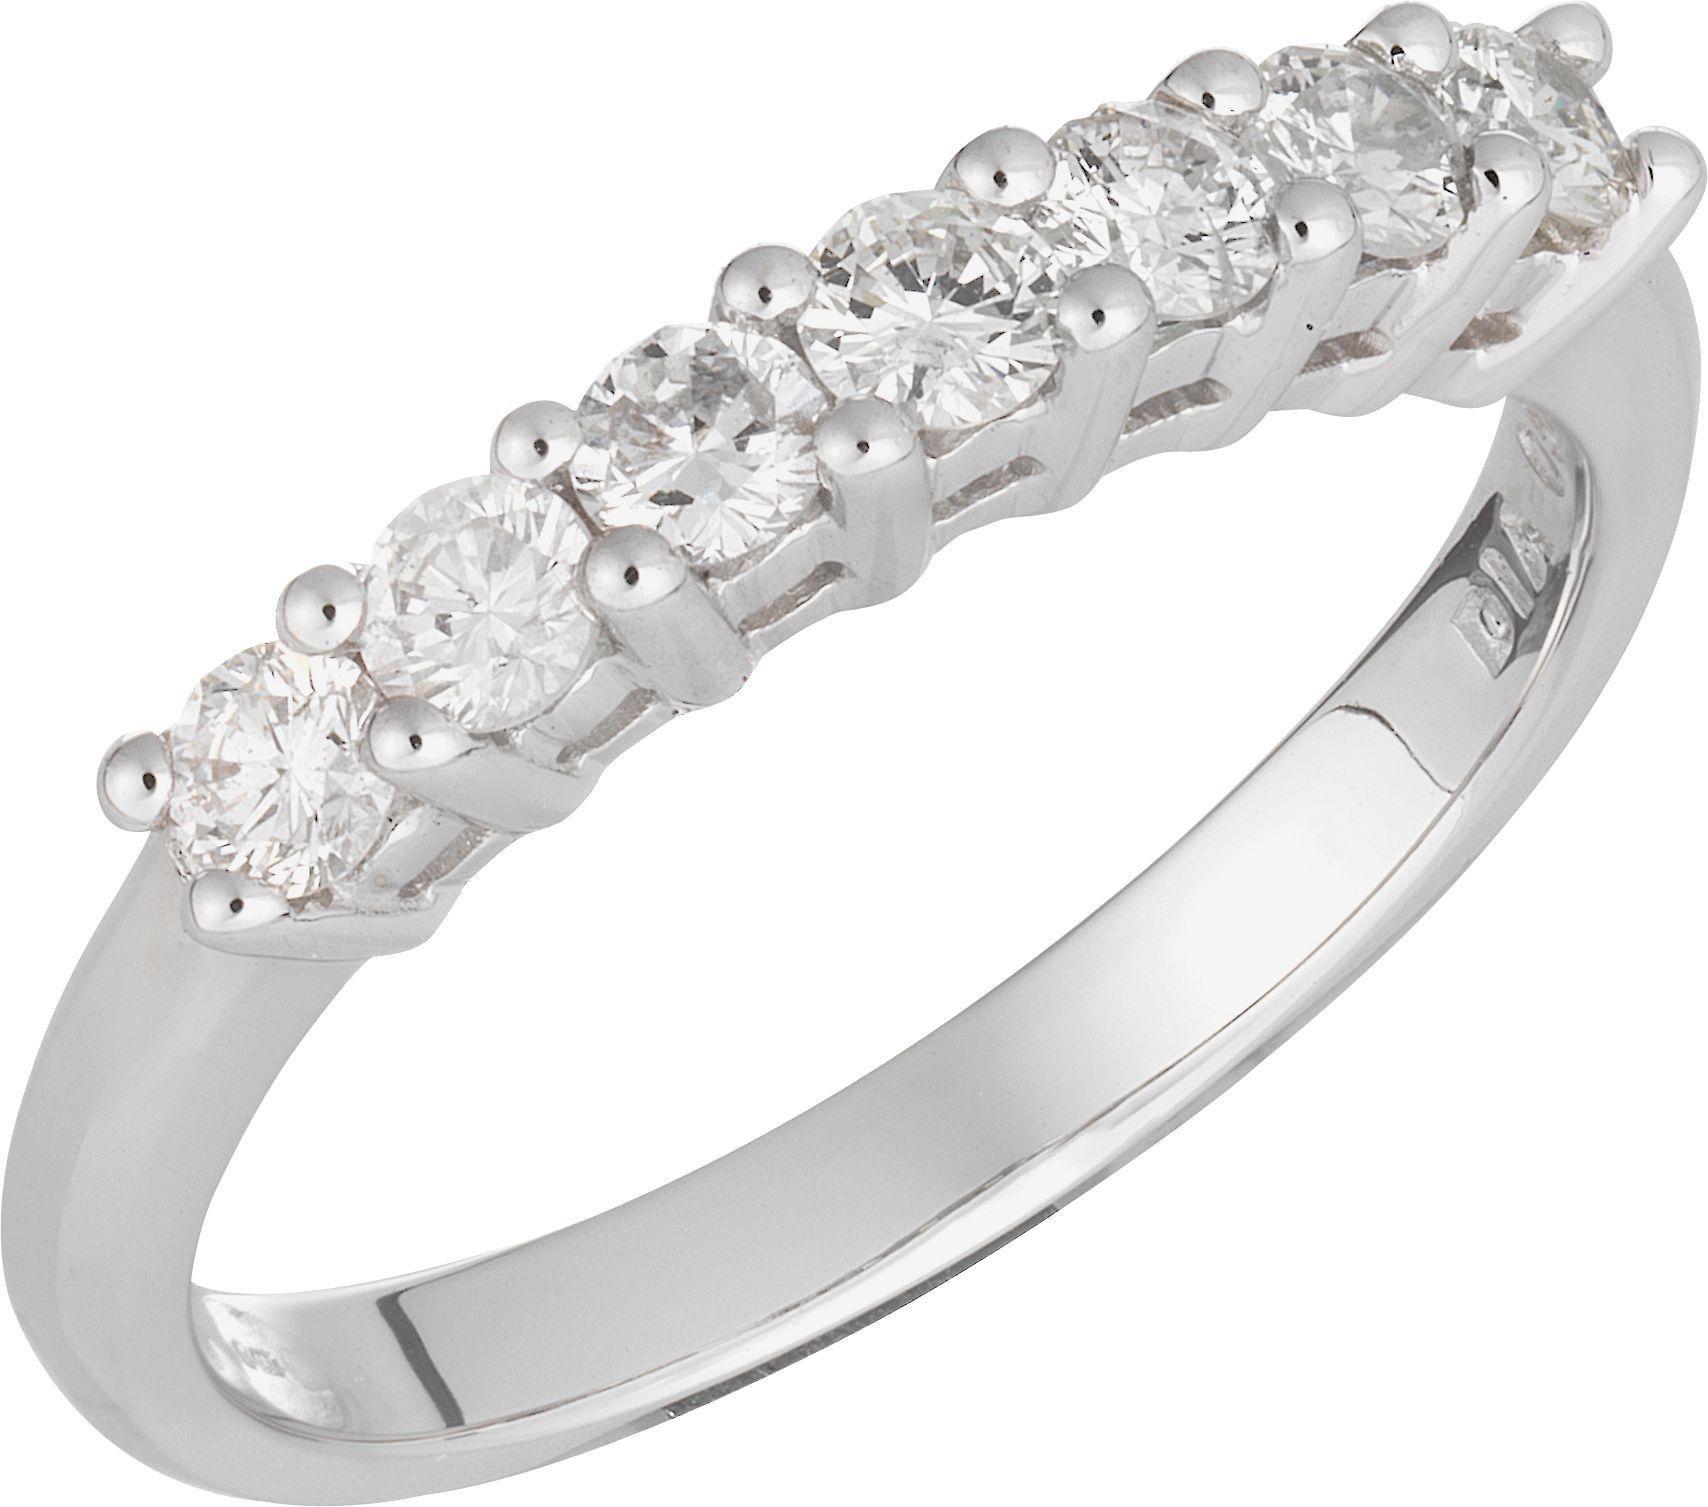 Buy Everlasting Love 9ct White Gold 7 Stone Eternity Ring K at